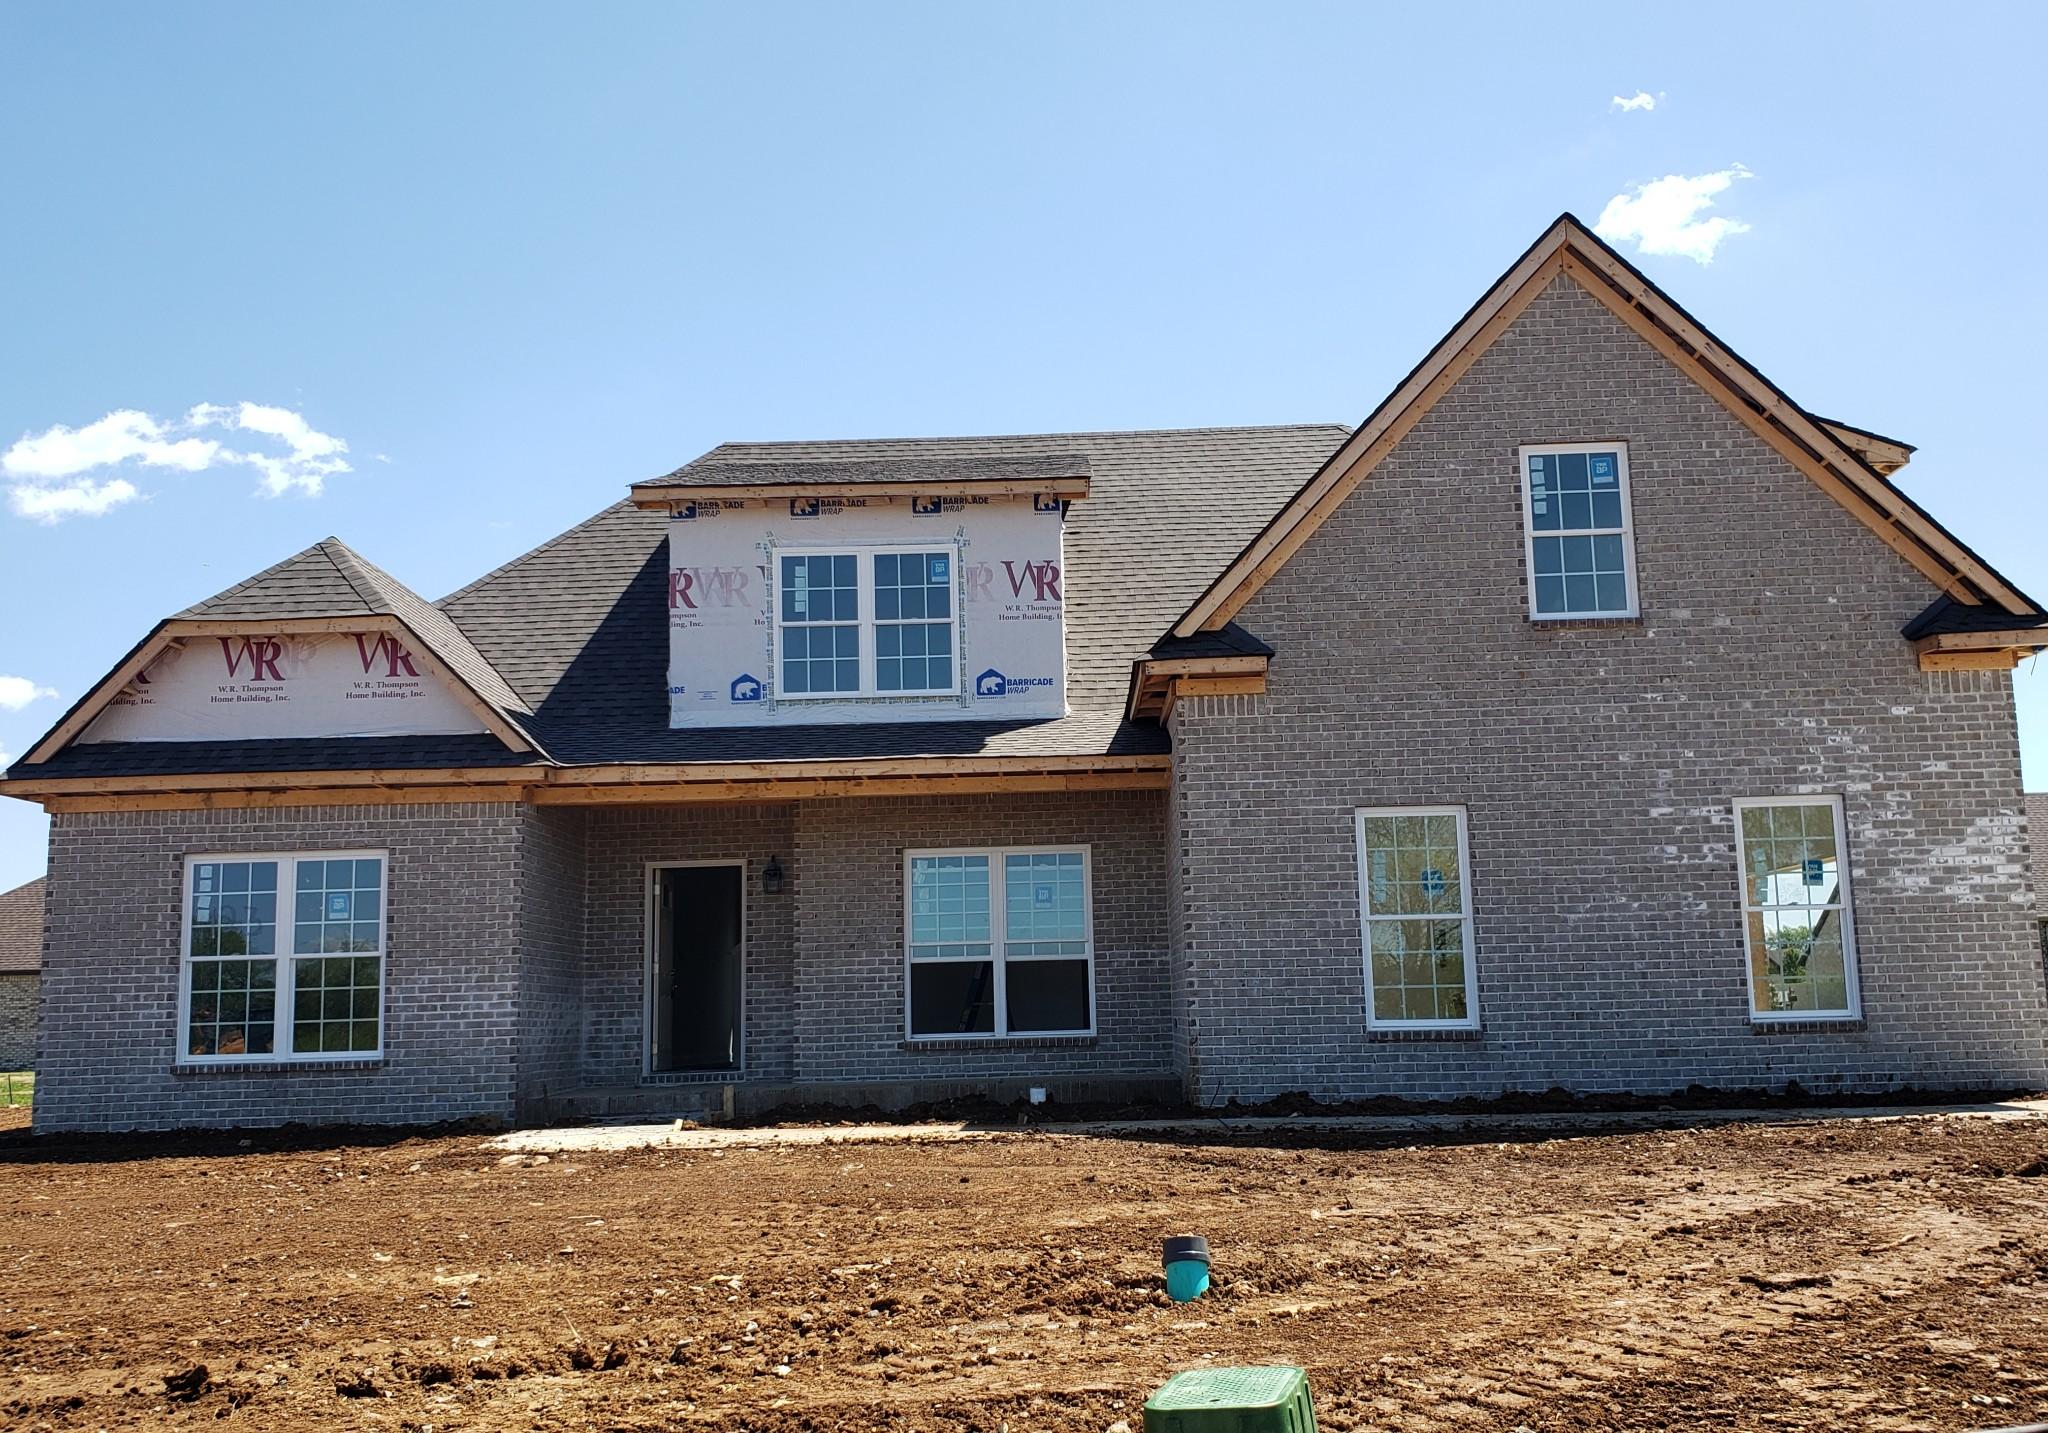 2307 Tredwell Ave. #123, Murfreesboro, TN 37128 - Murfreesboro, TN real estate listing